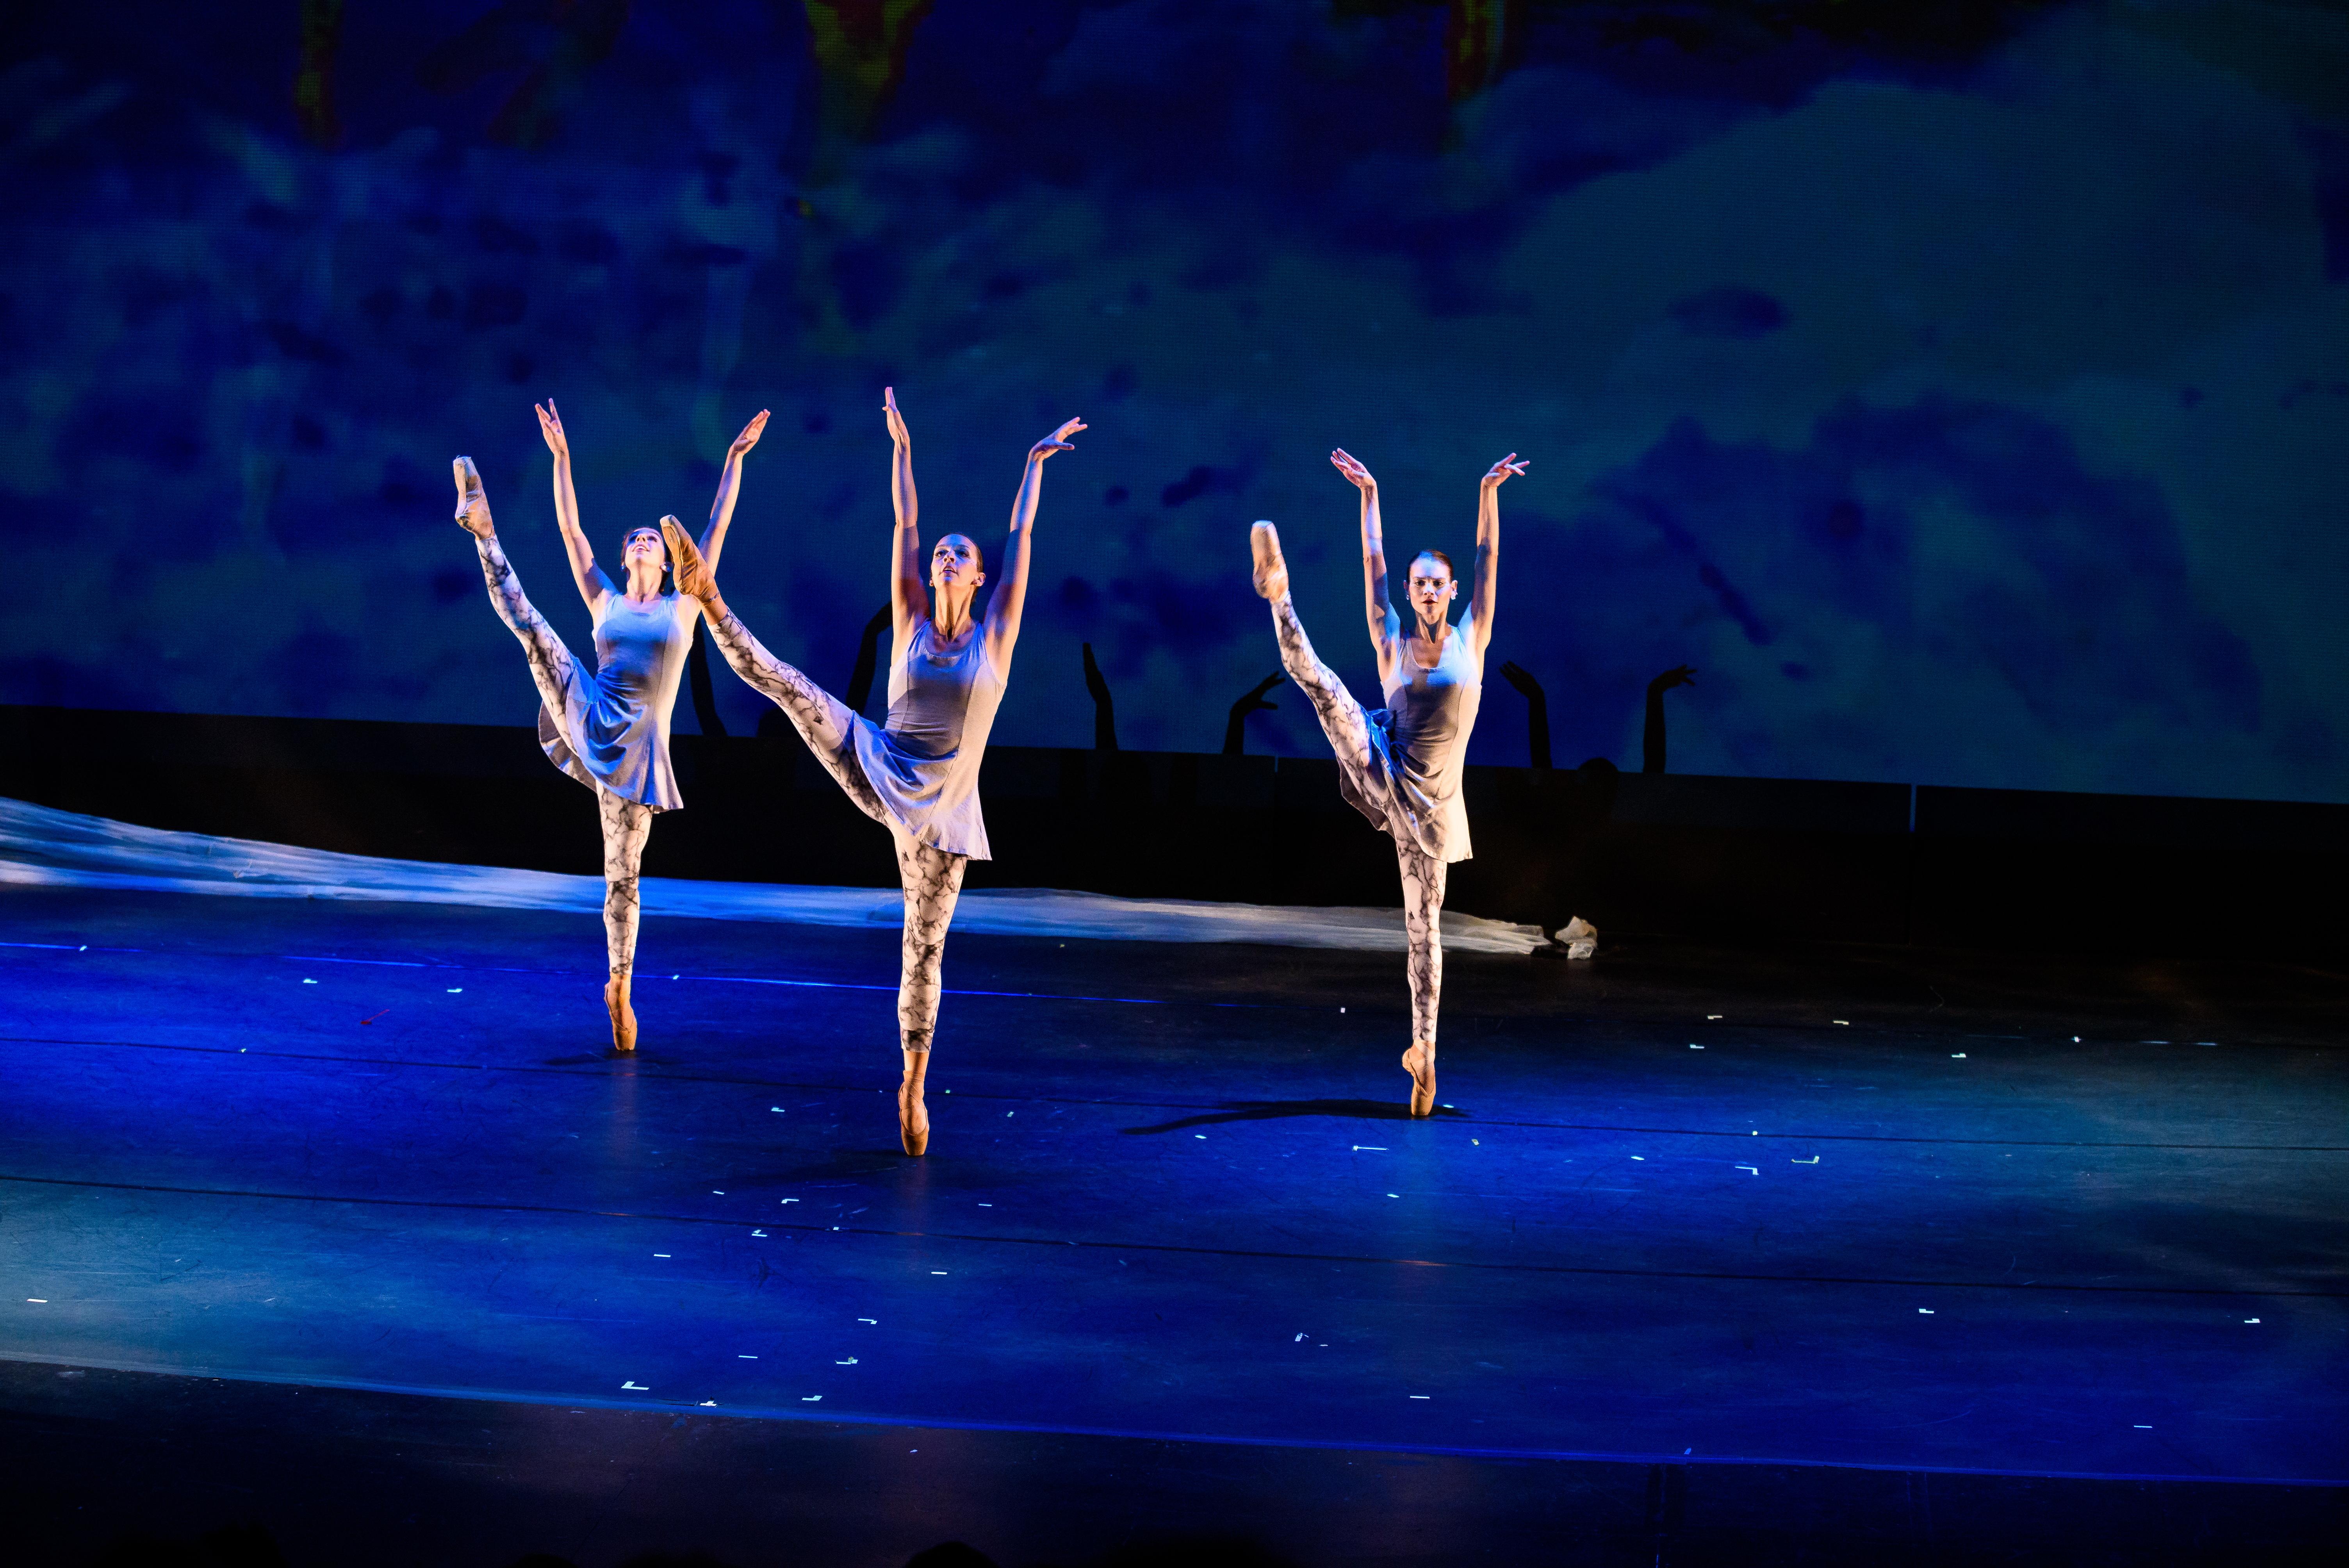 MOVEIUS Contemporary Ballet performs GLACIER: A Climate Change Ballet